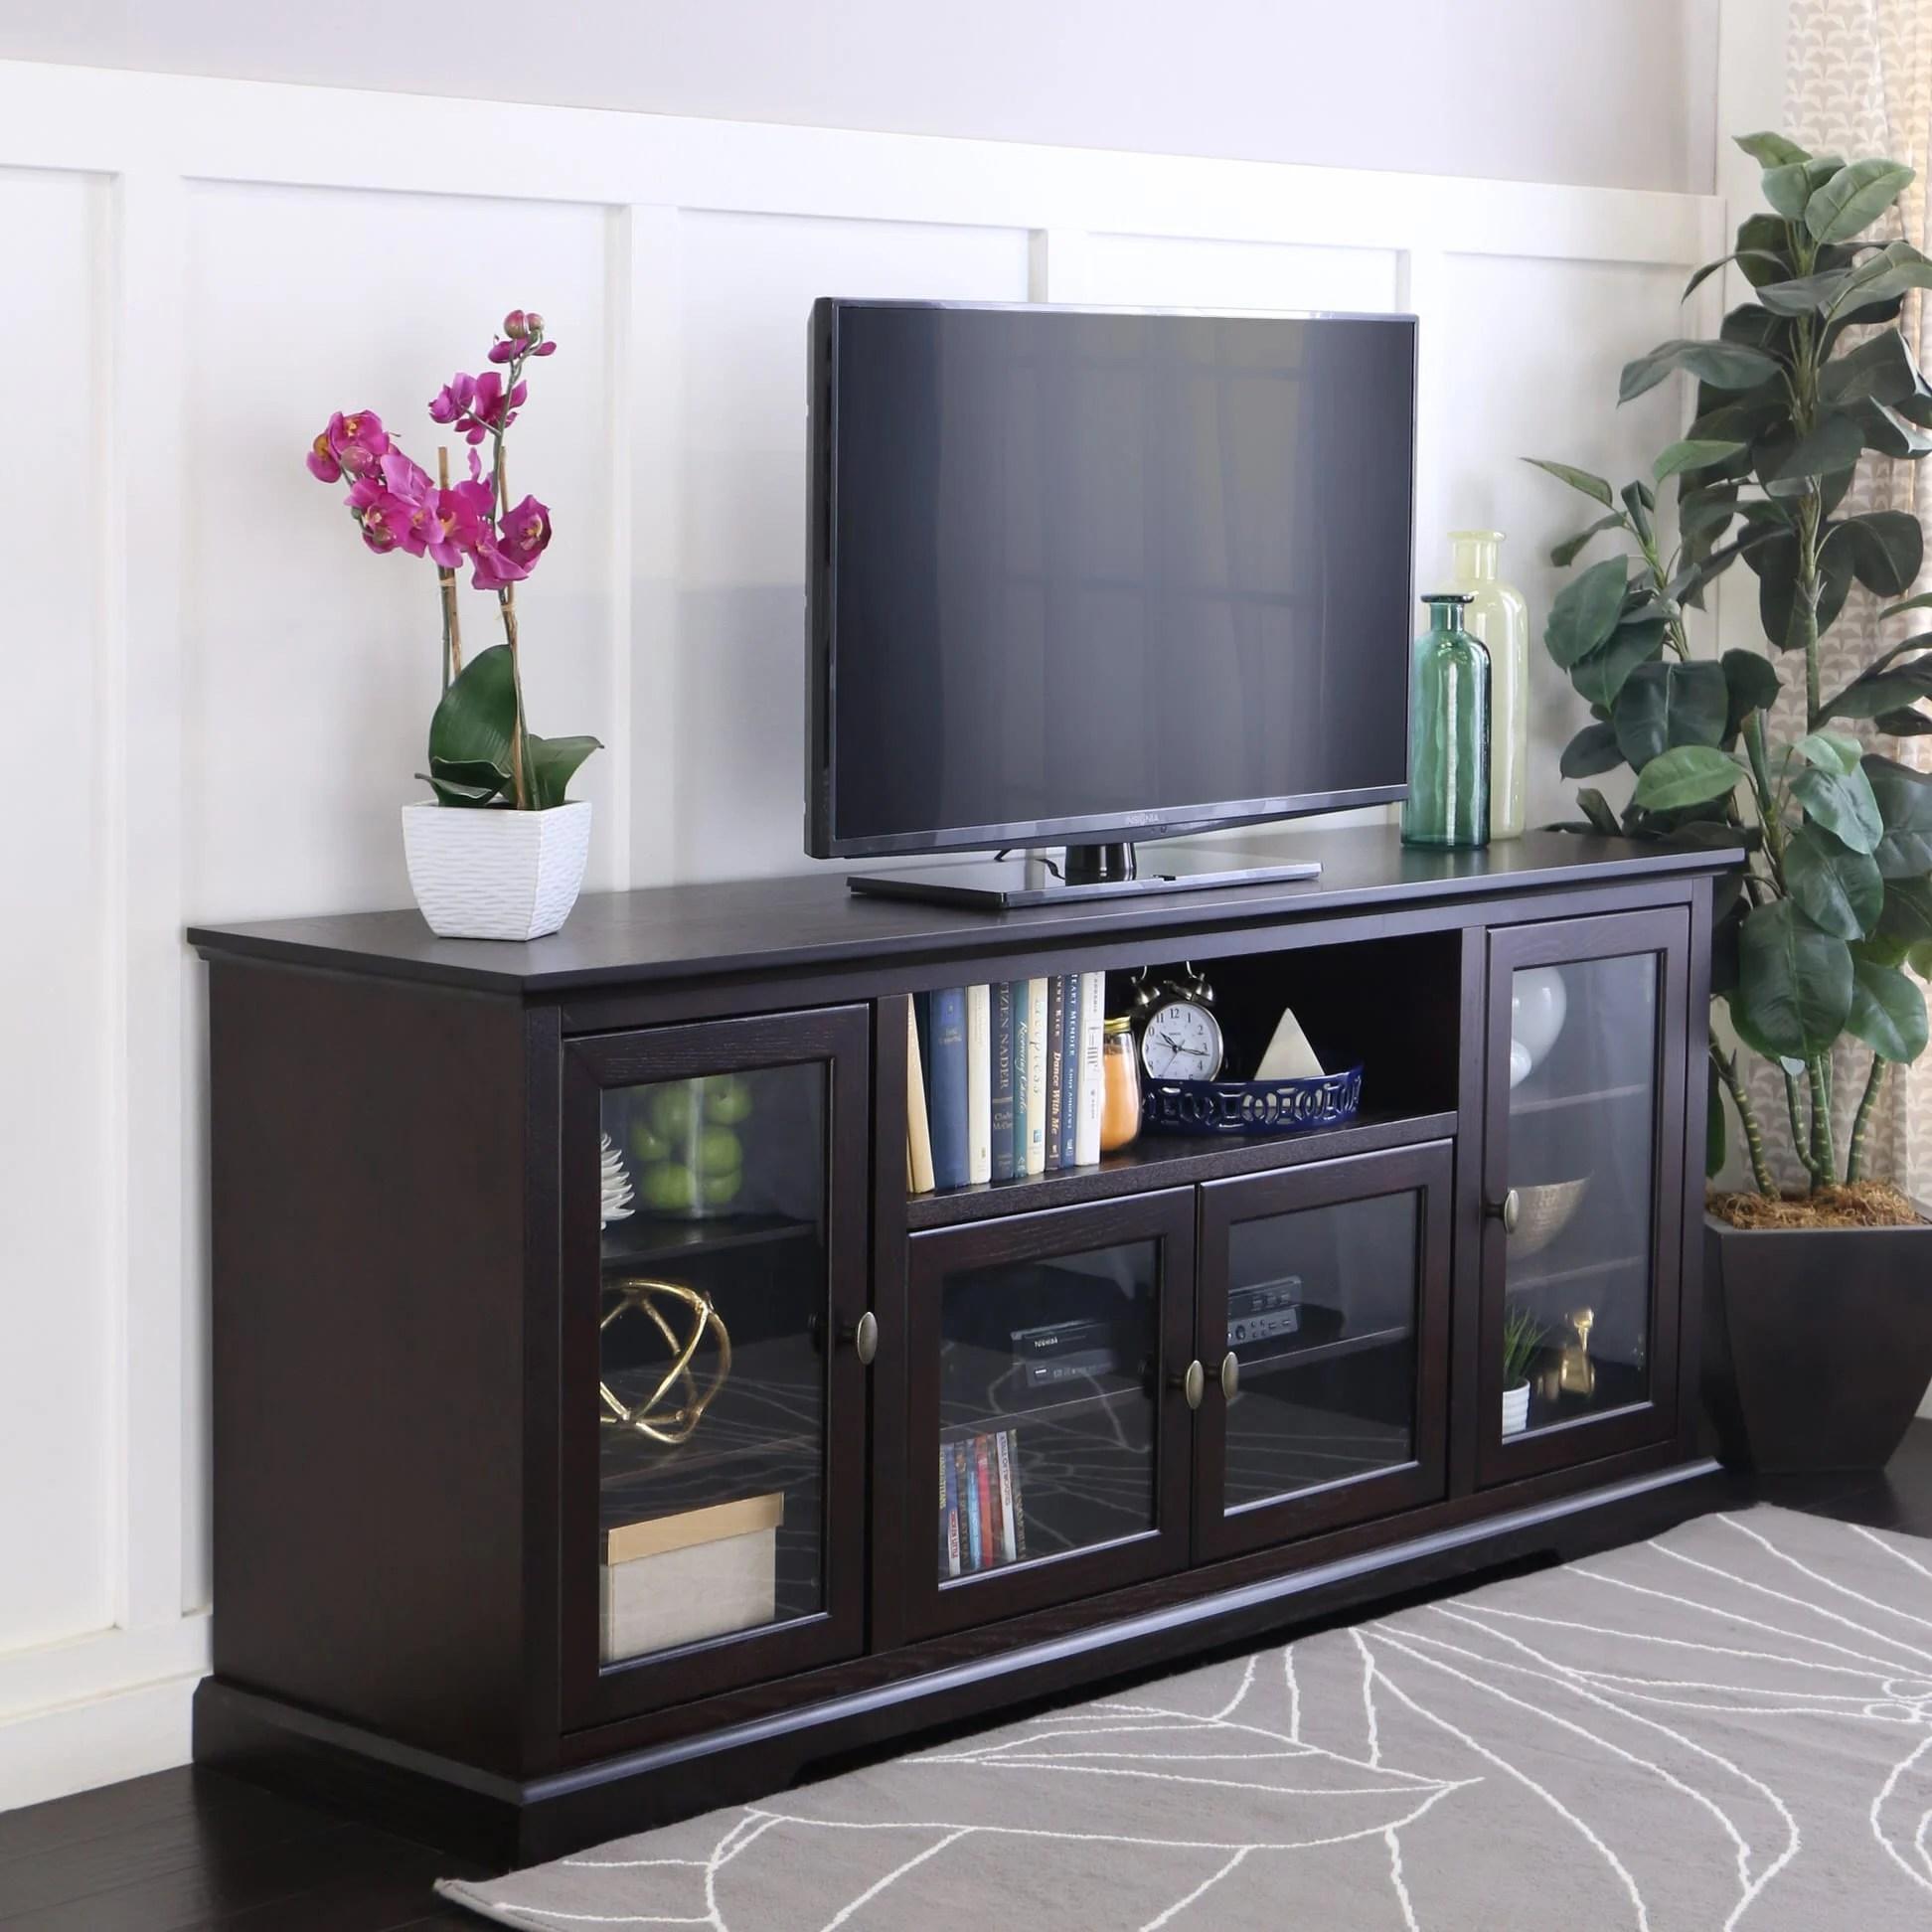 Furniture Deals New York